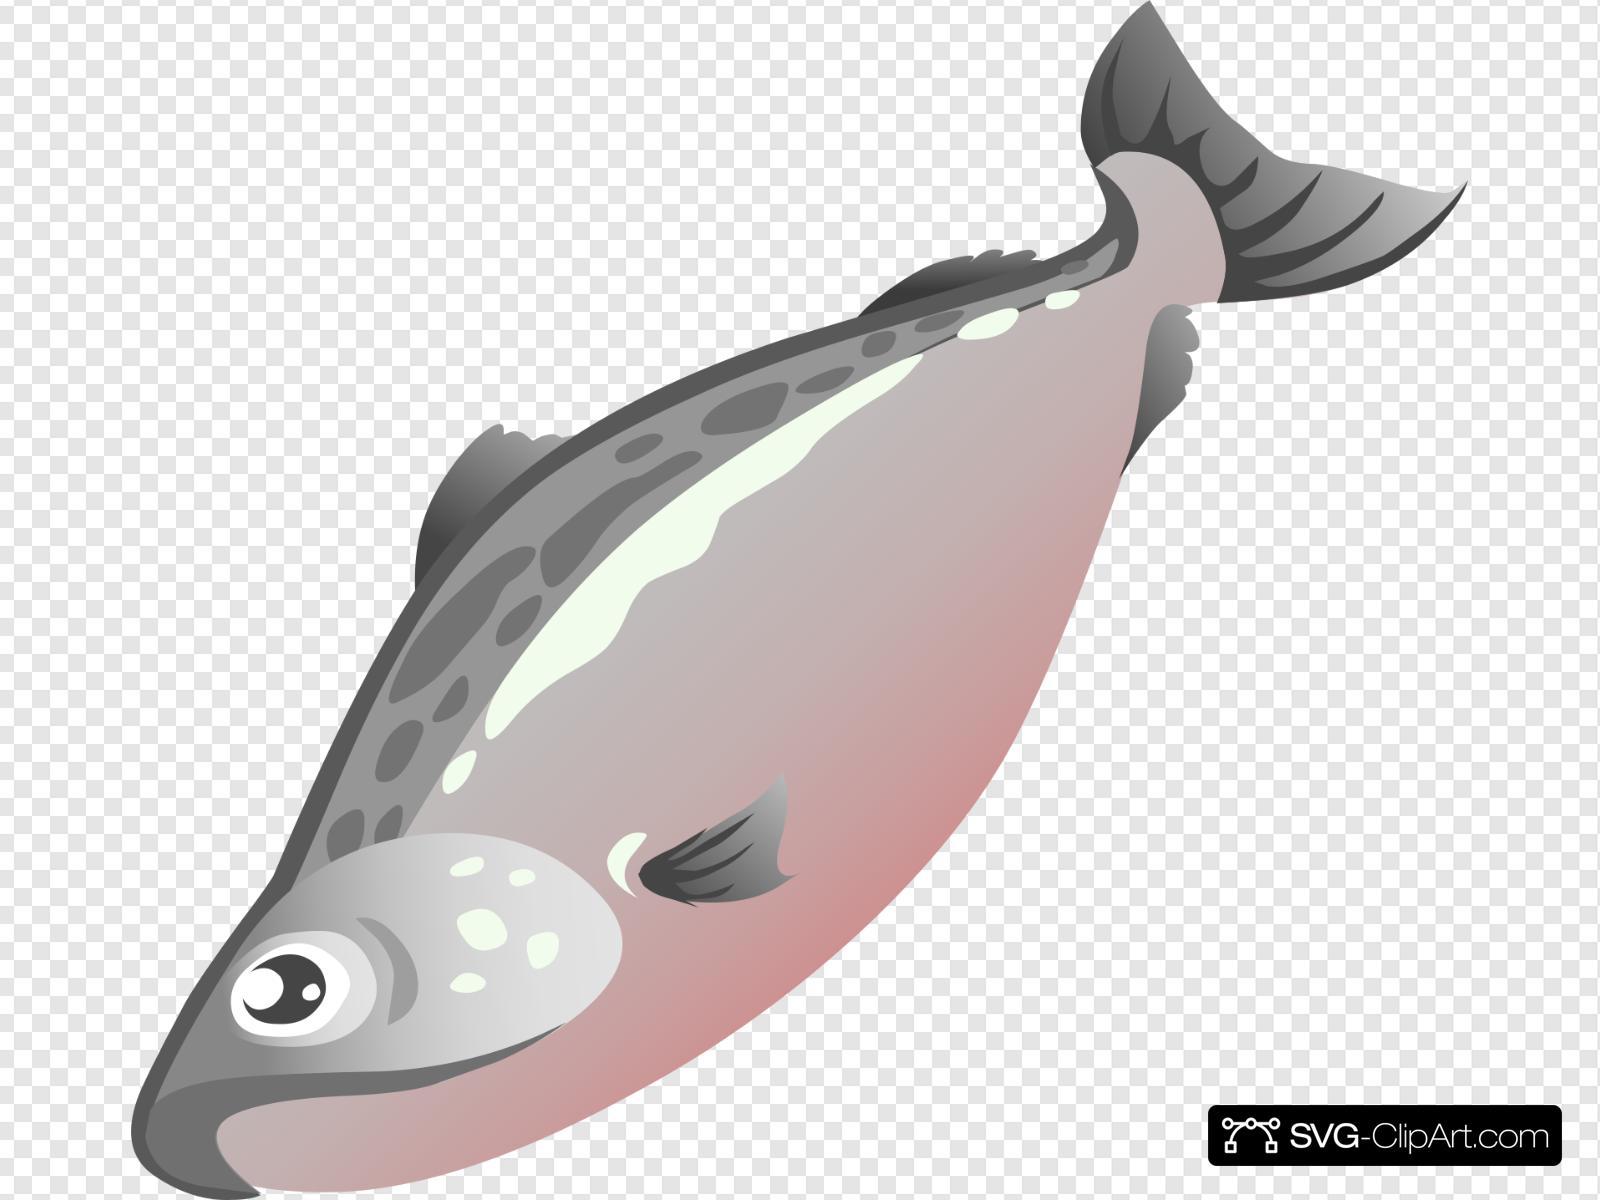 Salmon clipart svg. Clip art icon and